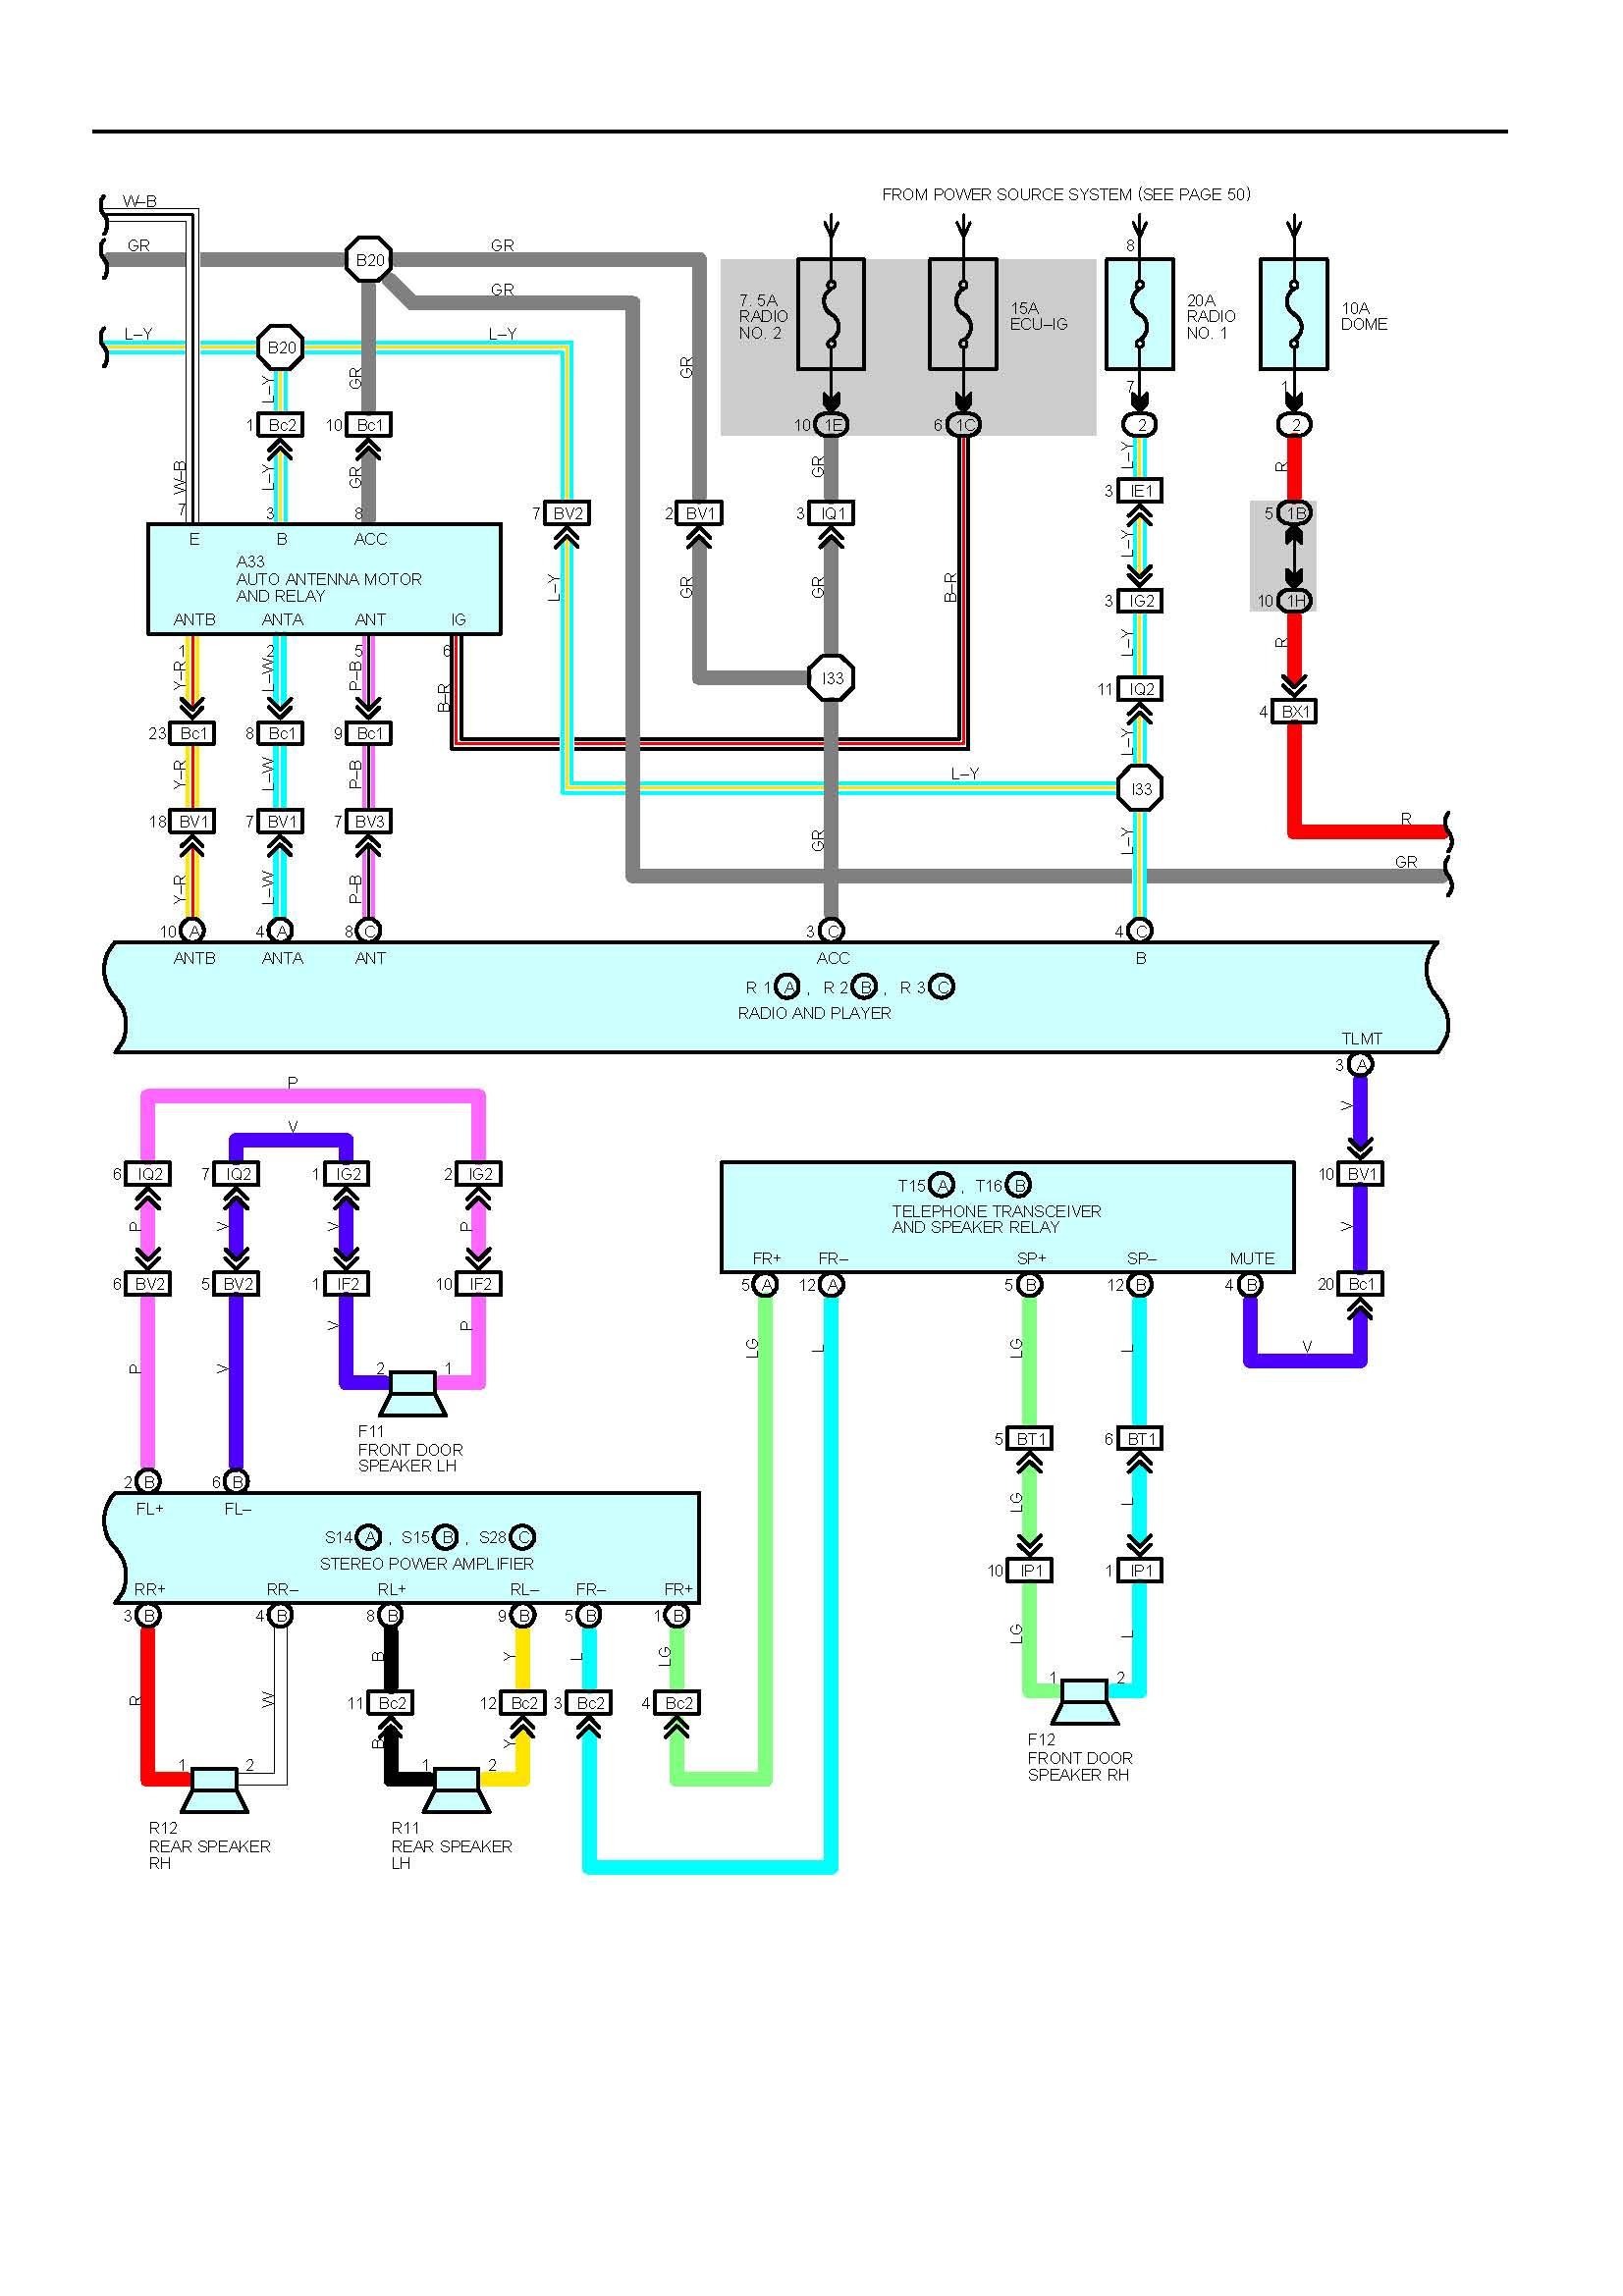 1995 fleetwood southwind rv wiring diagram   42 wiring